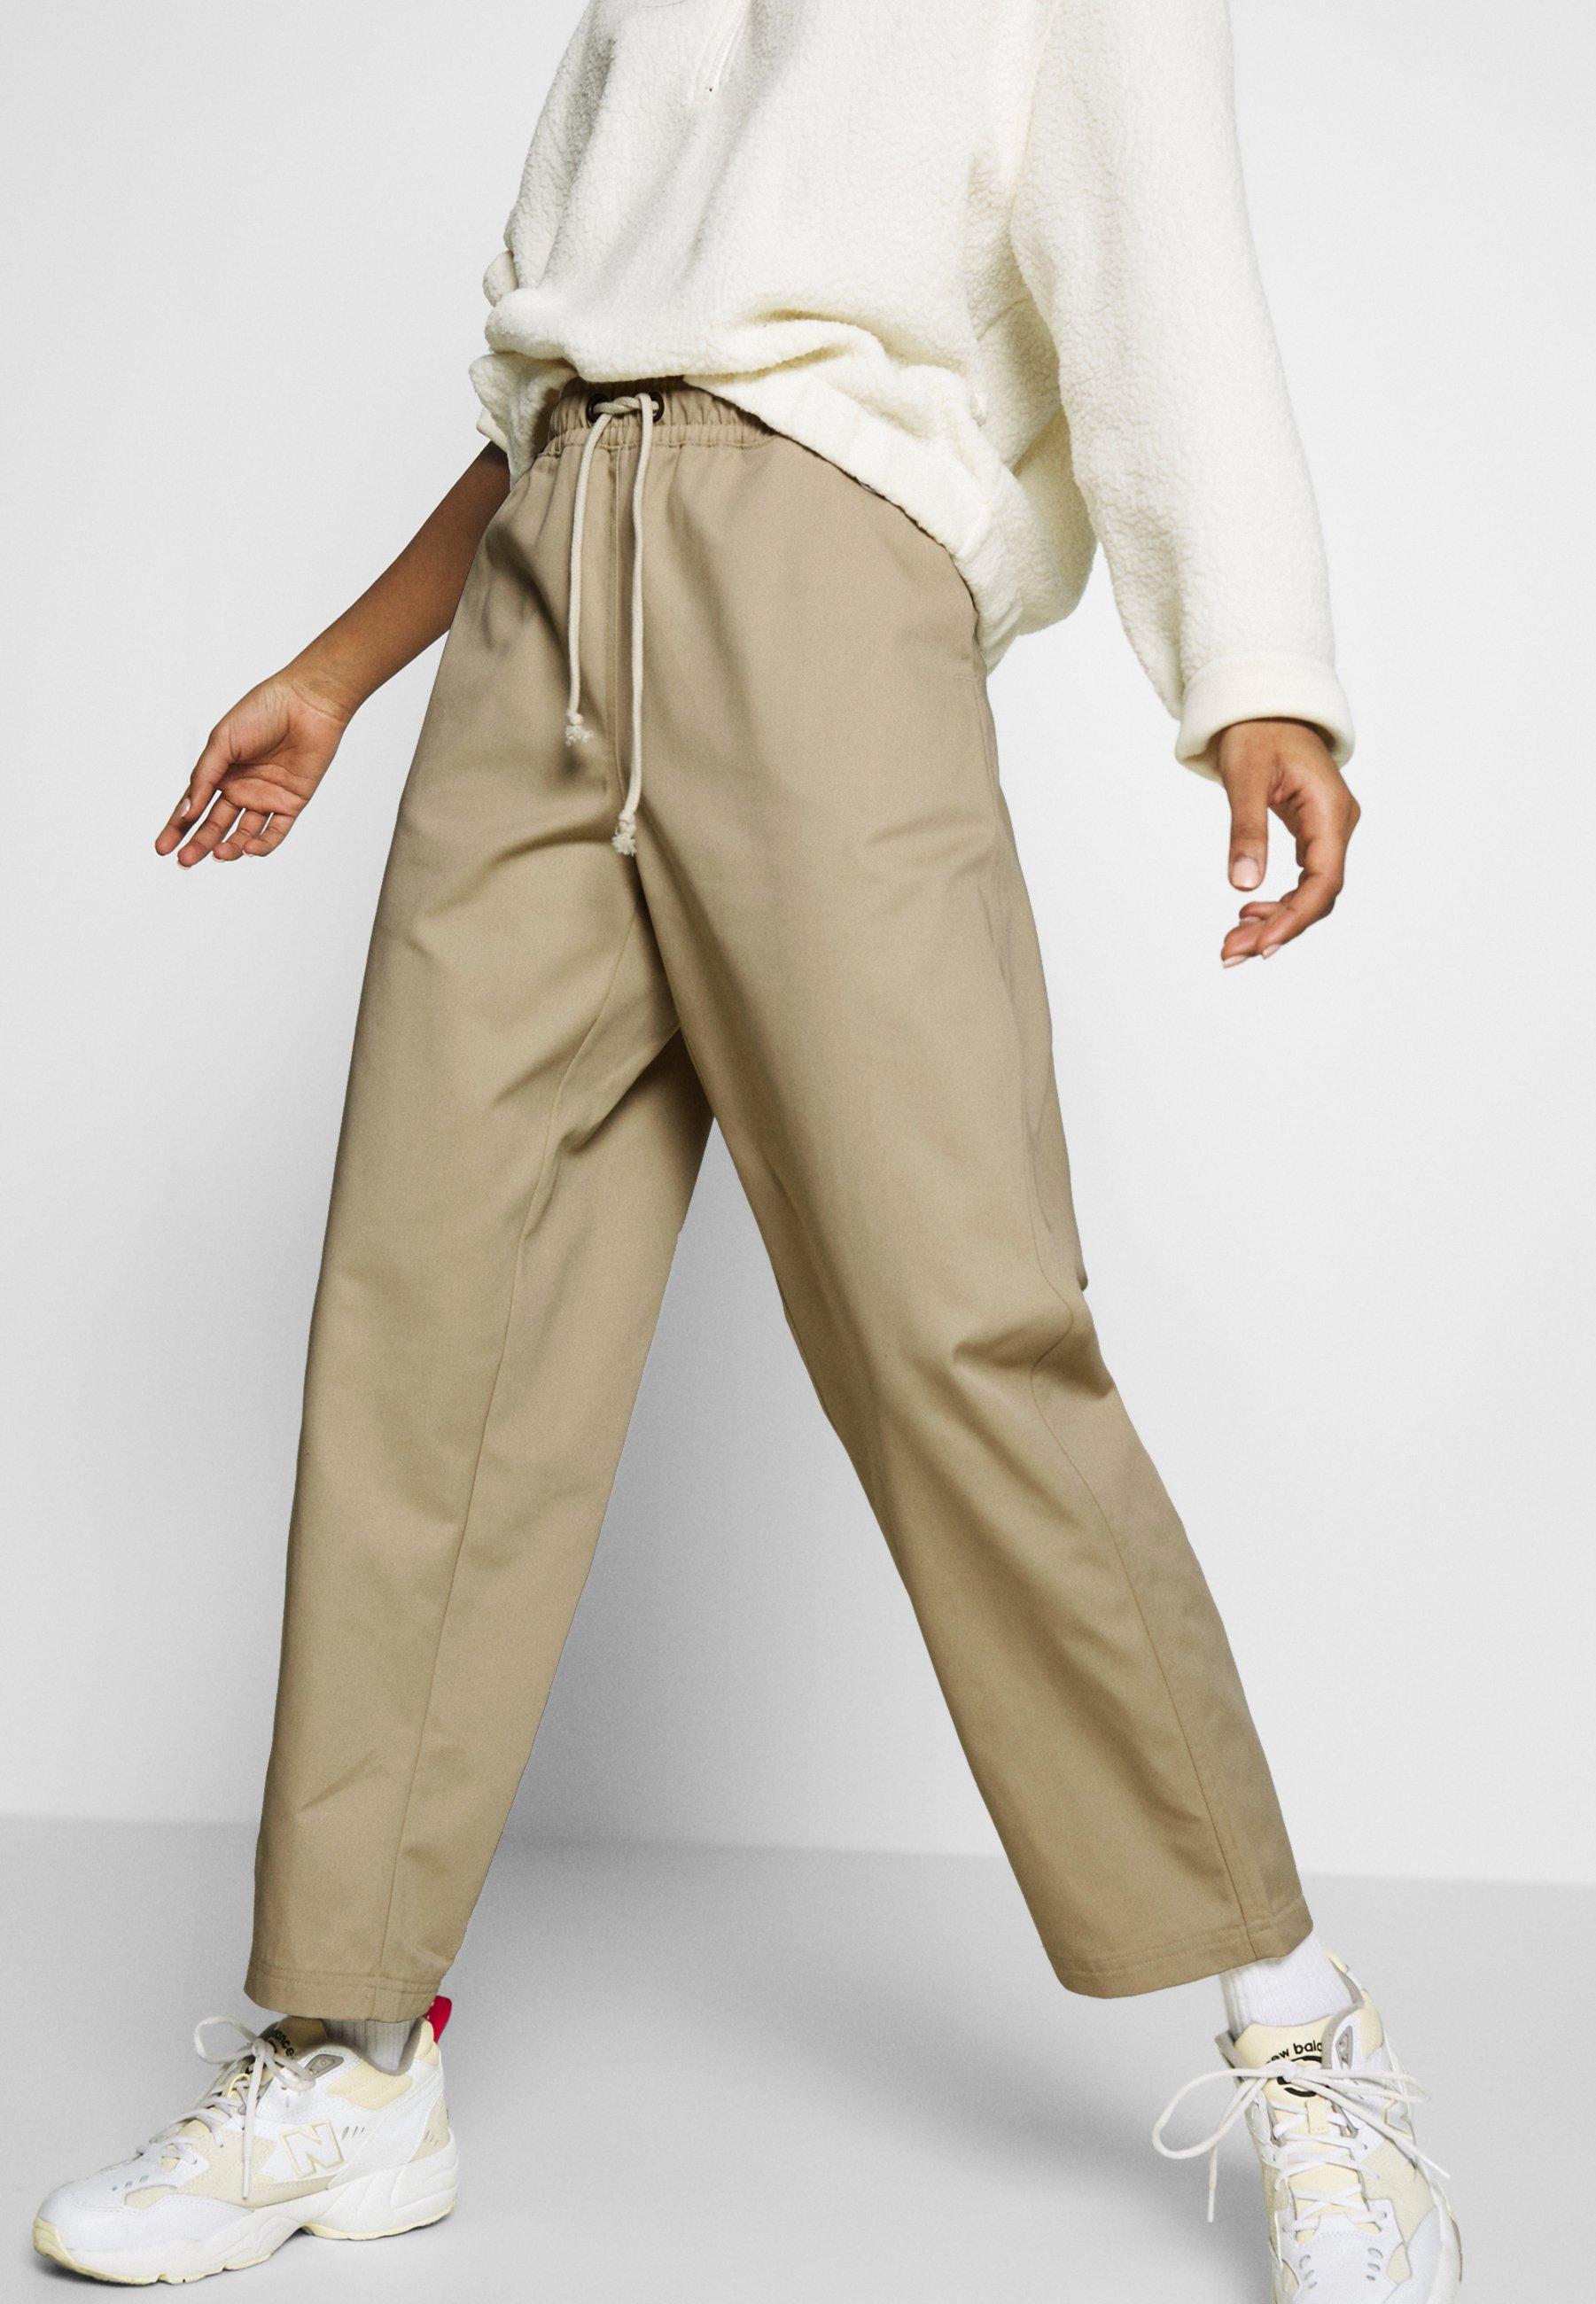 beige Patterned trousers  Etro  Baggy bukser - Dameklær er billig